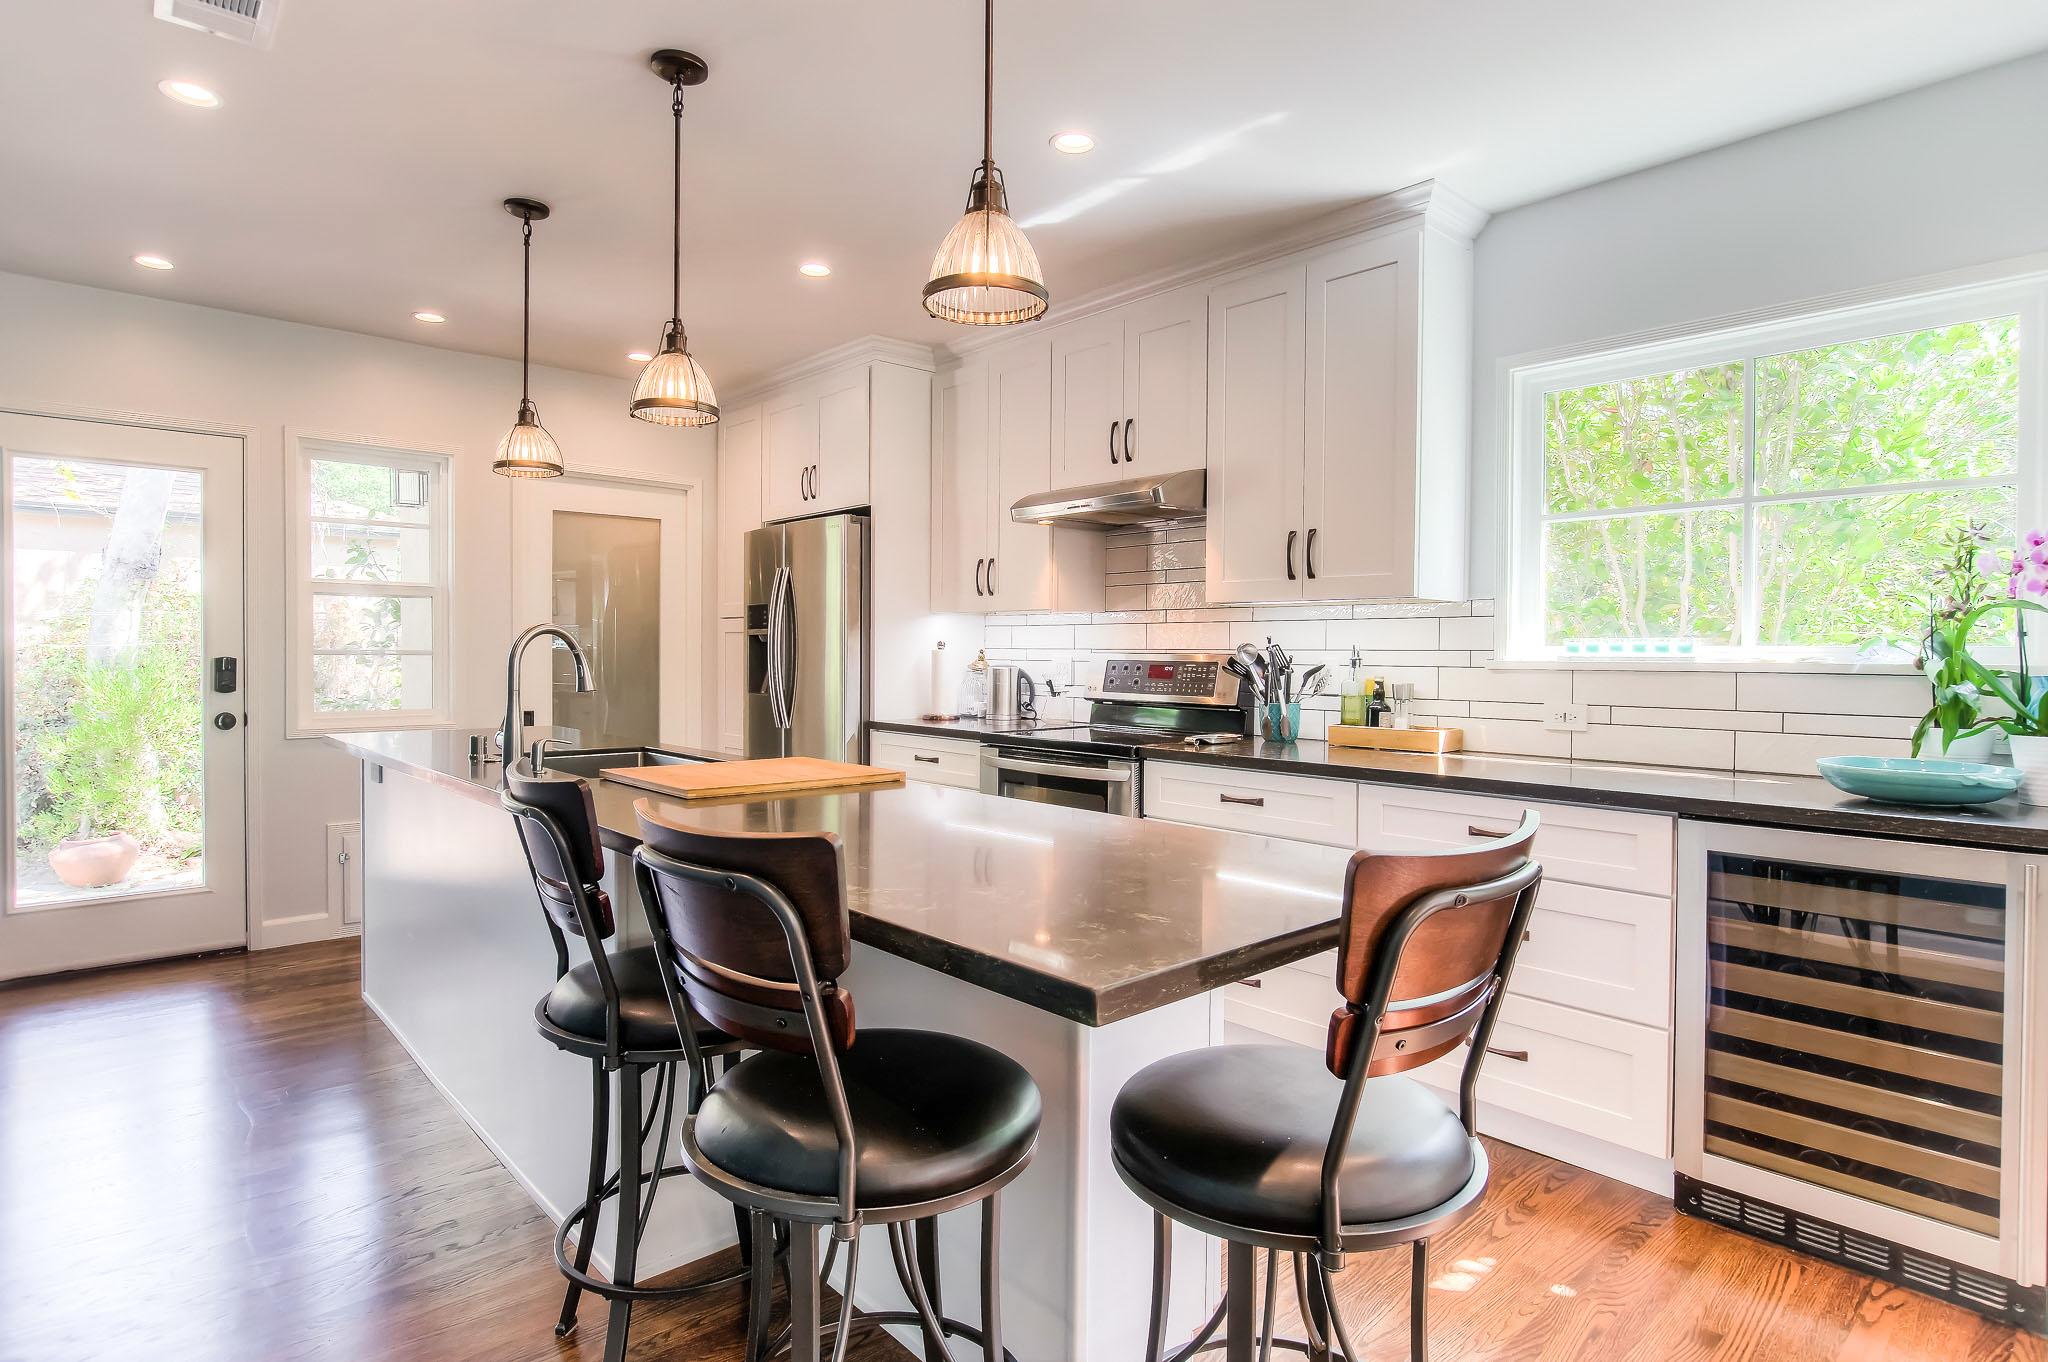 Glendale_new_kitchen_opt.jpg